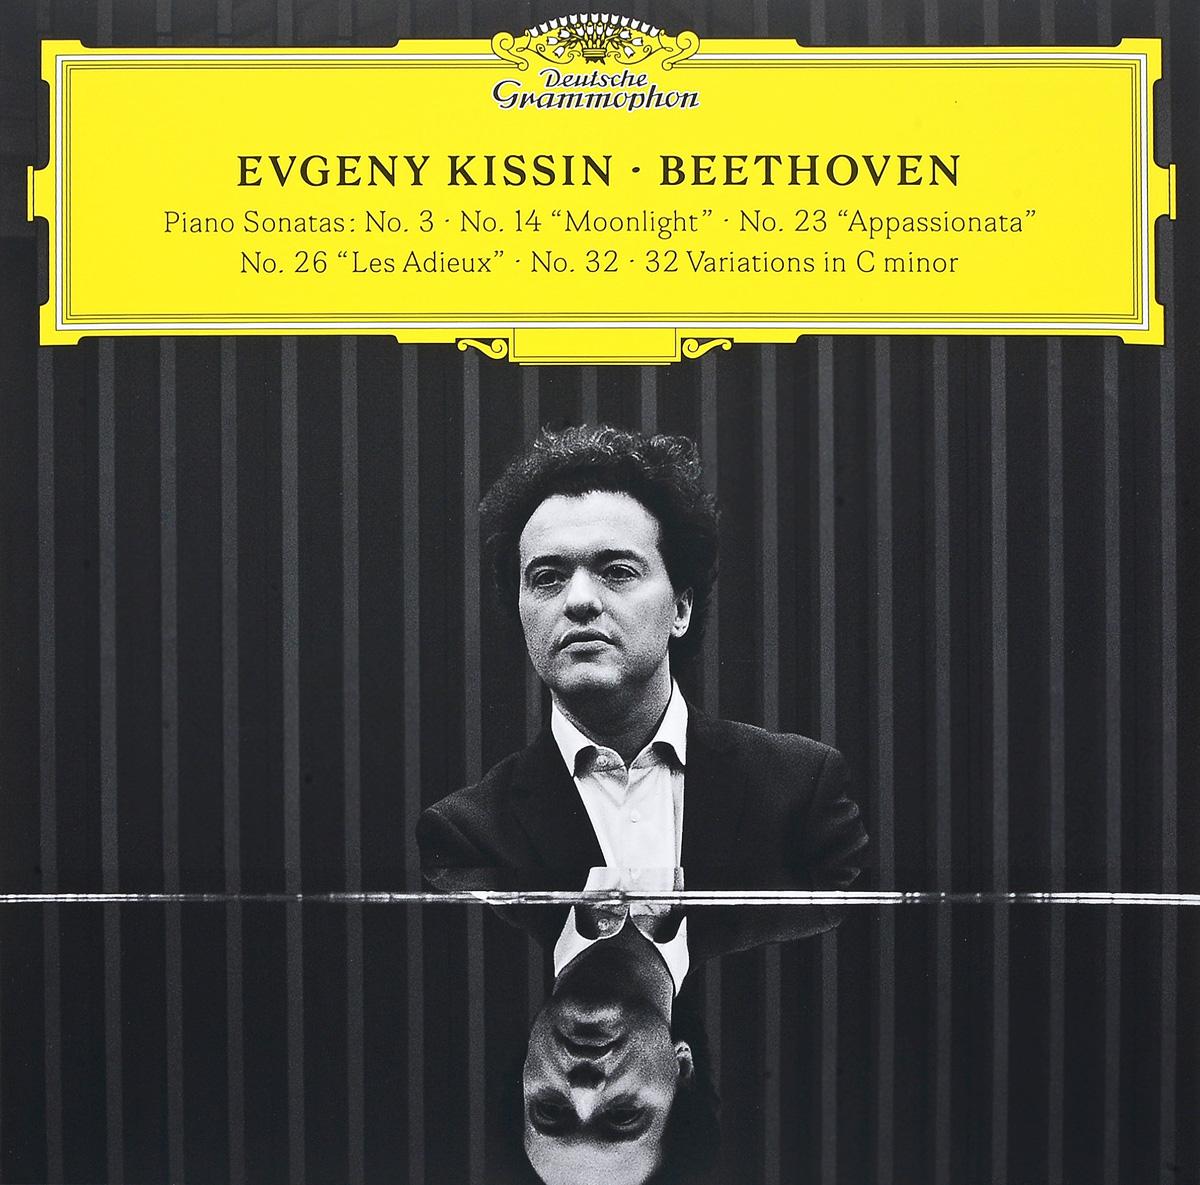 лучшая цена Yevgeny Kissin. Evgeny Kissin / Beethoven (3 LP)